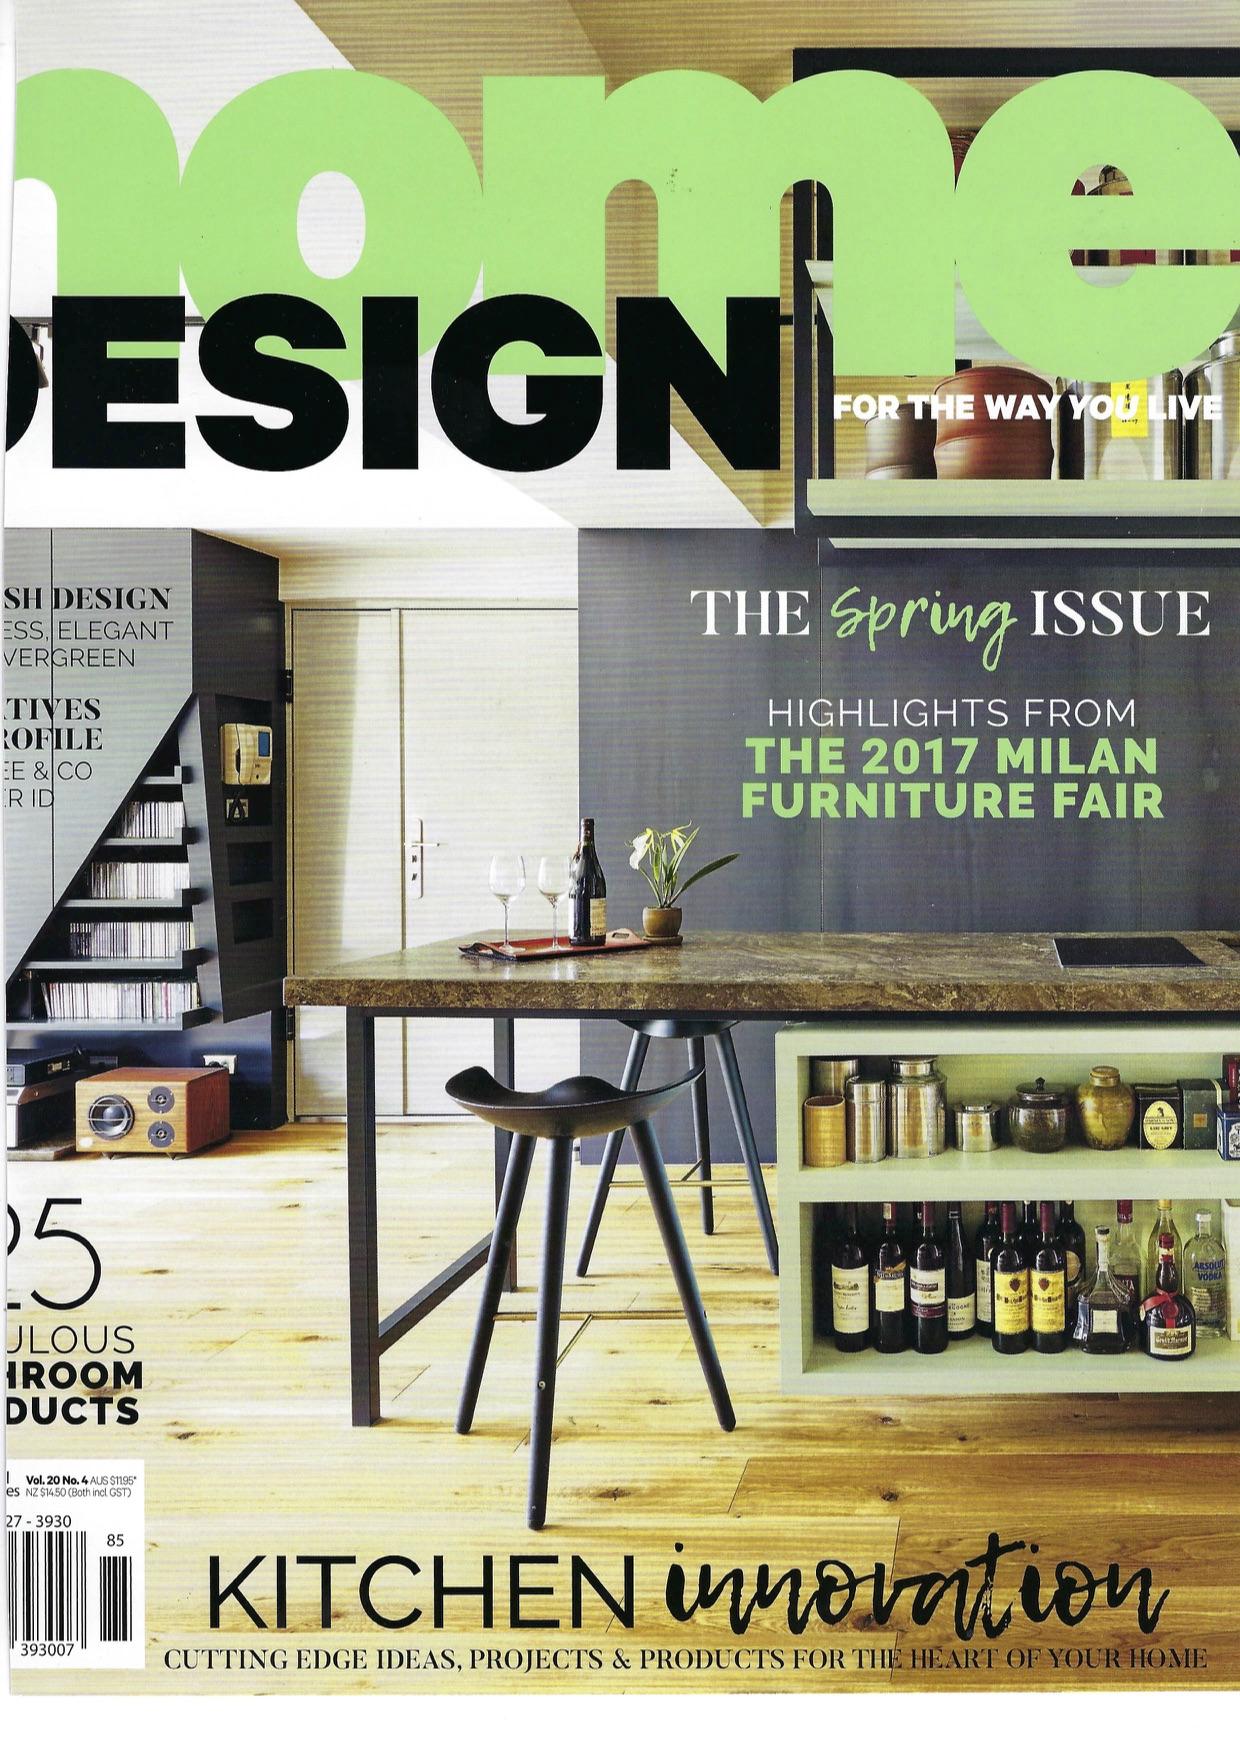 home-design-vol-24-cover.jpg